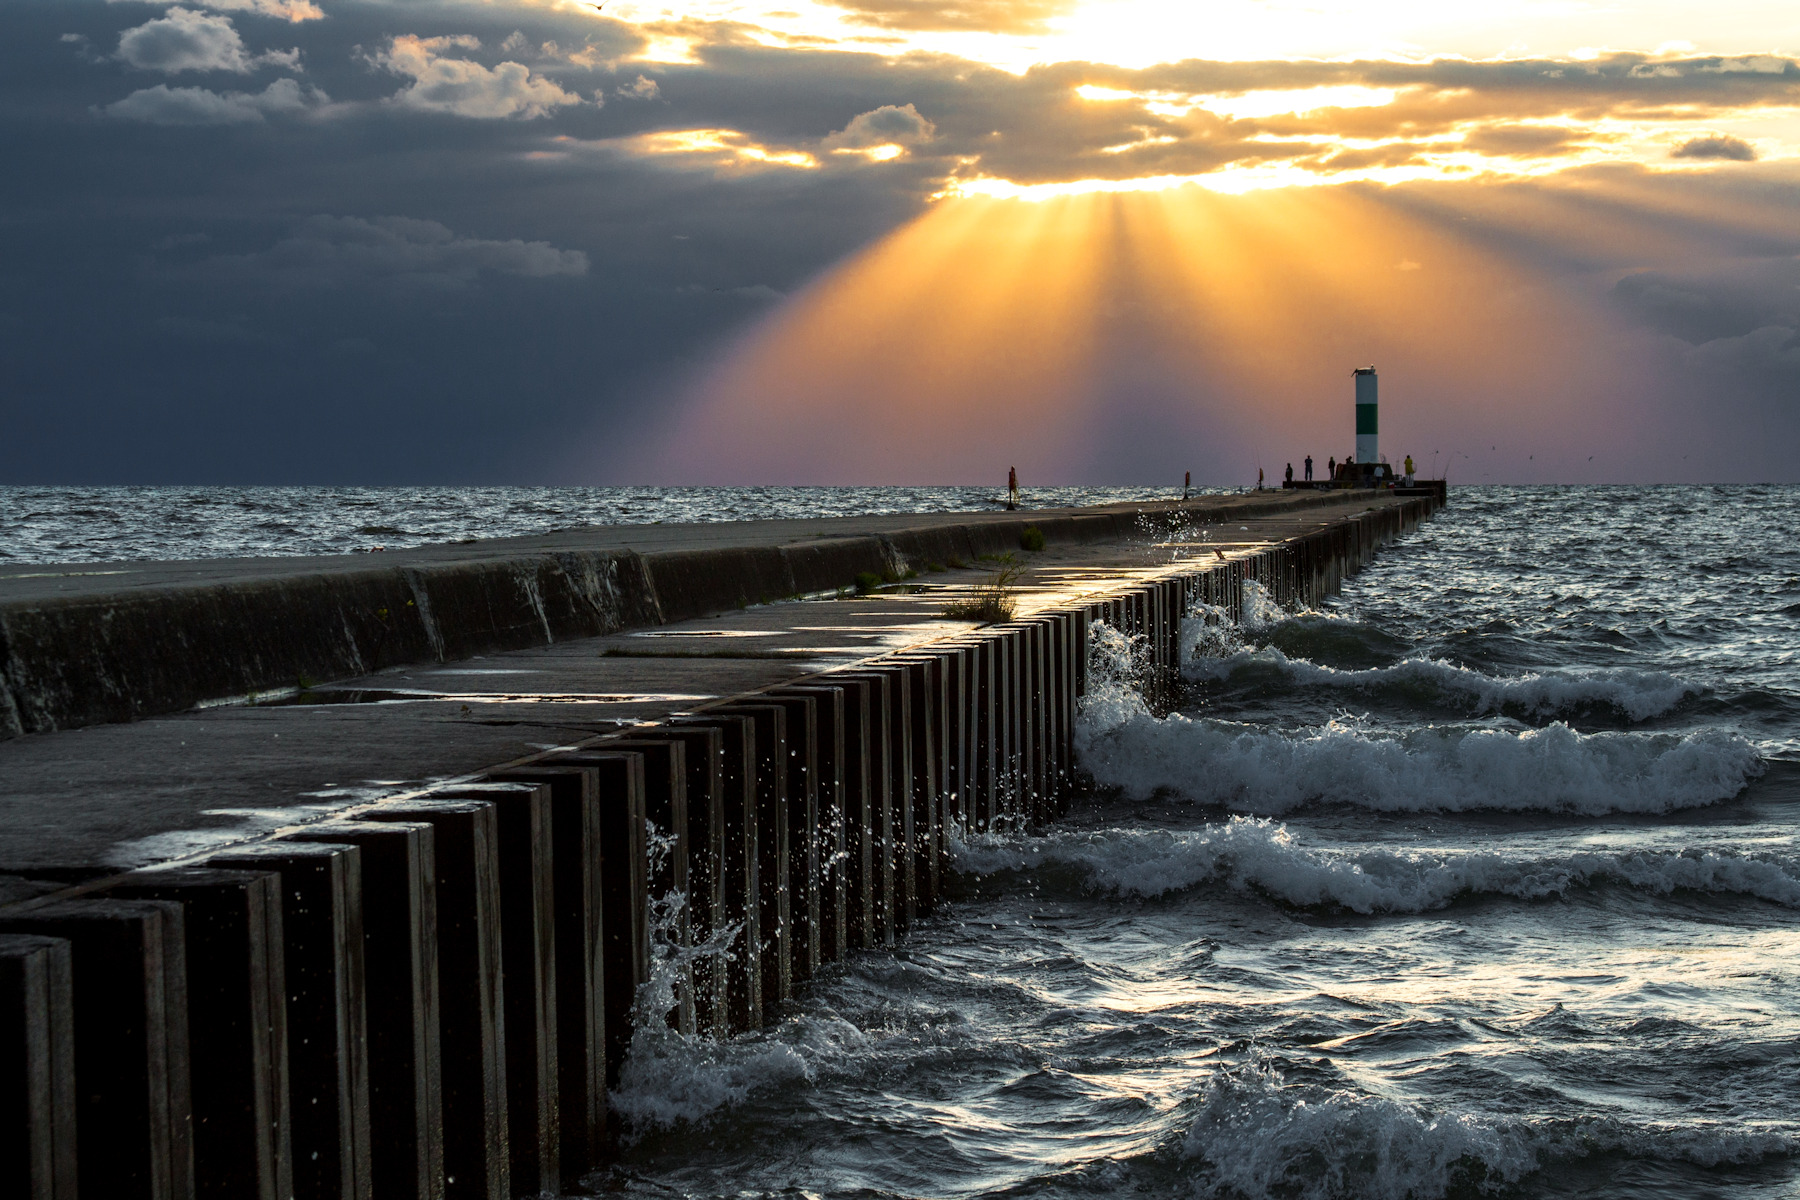 North Pier Image by Bob Walma